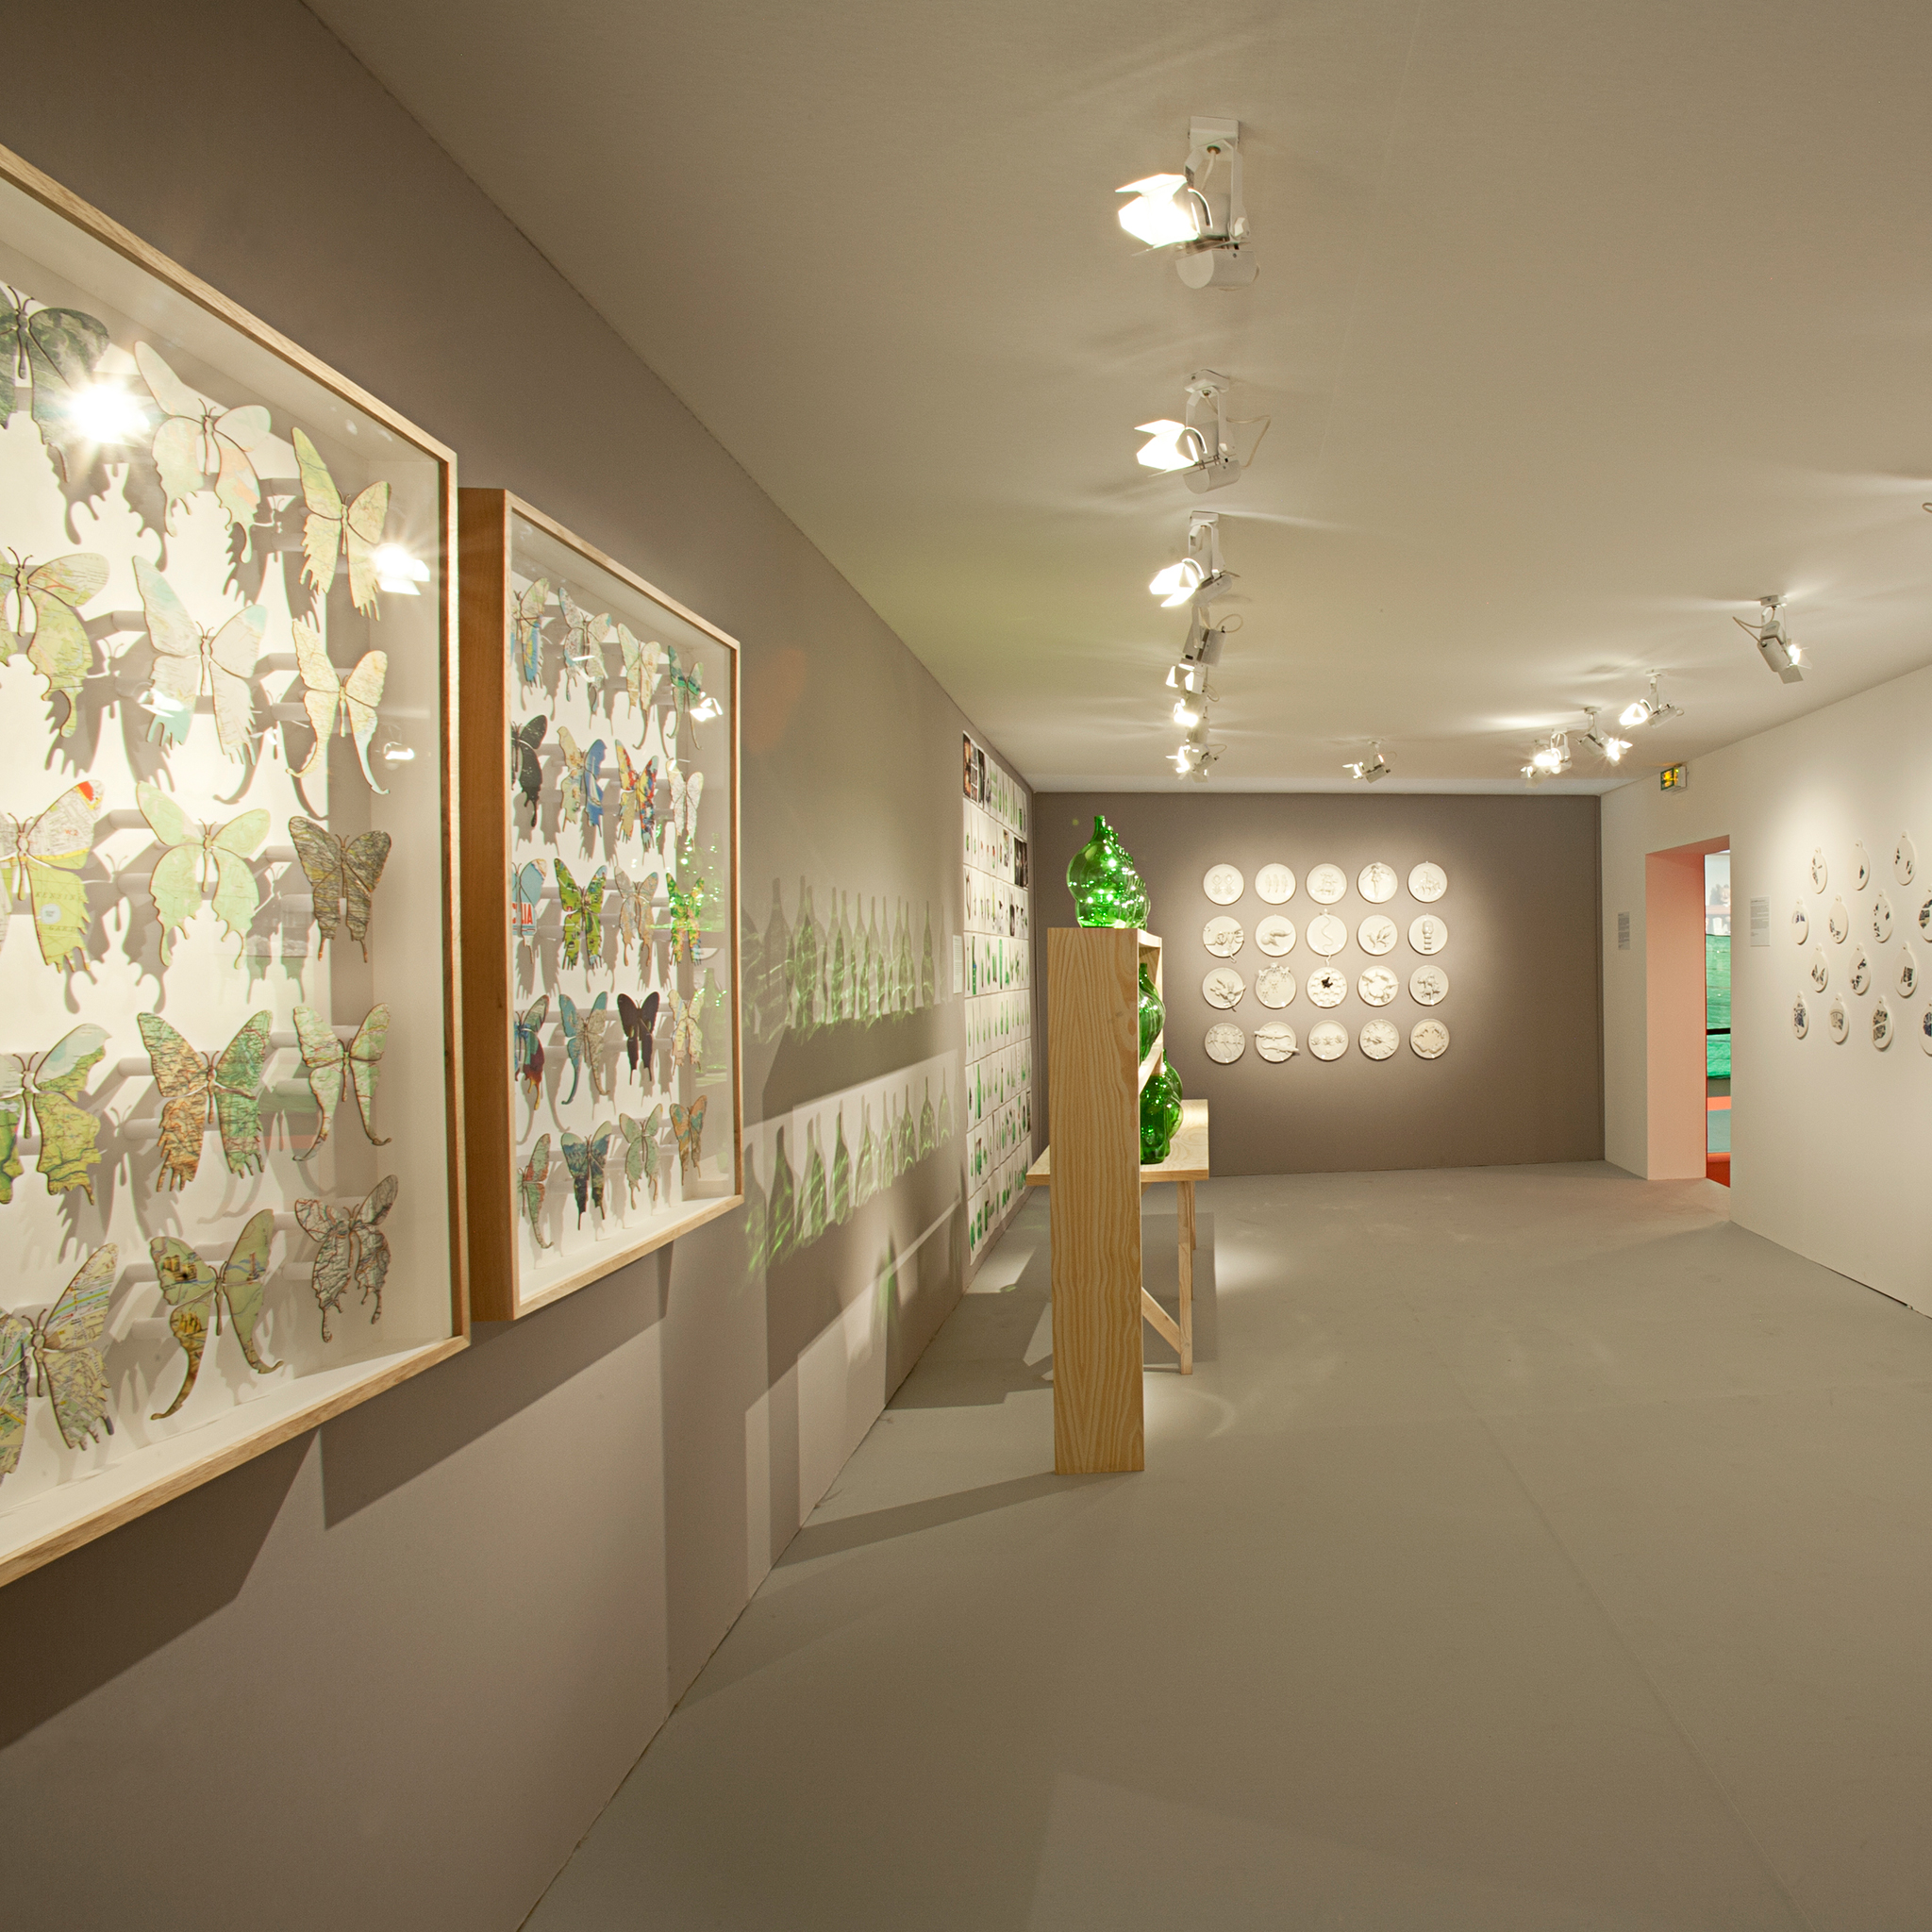 Maison-et-Objet-2011-Paris-imagesurgery-butterfly-art-3